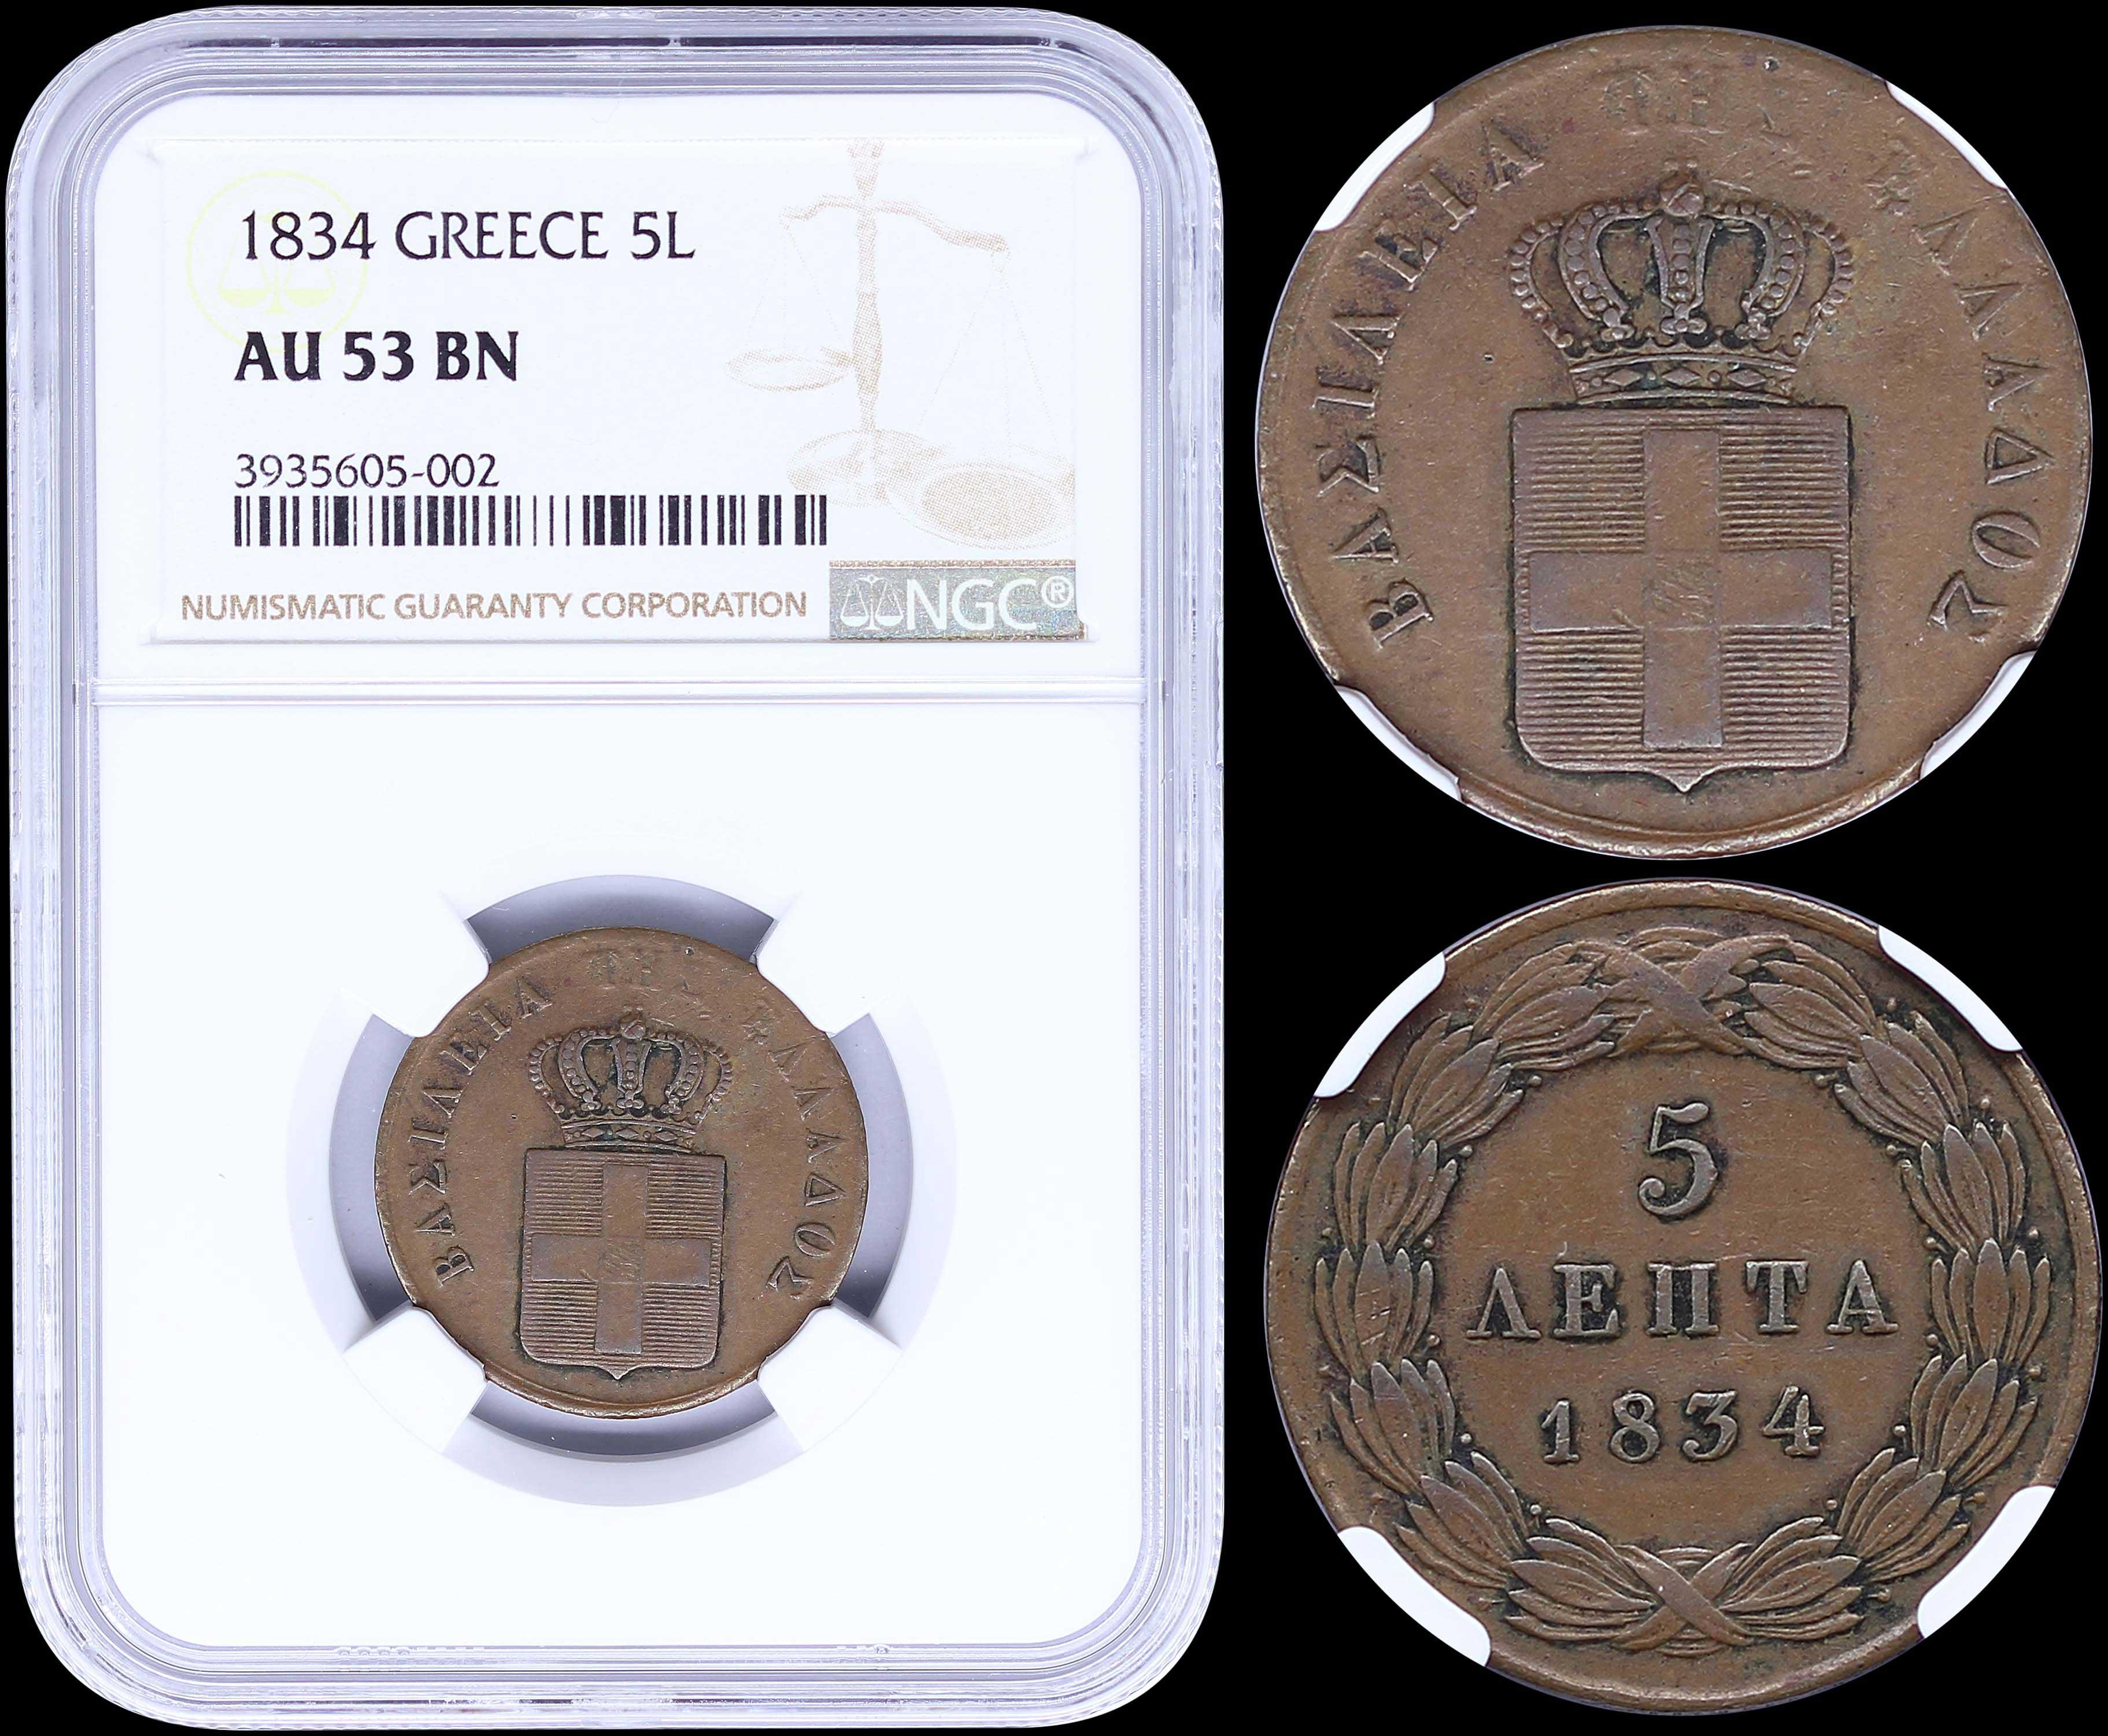 Lot 6071 - -  COINS & TOKENS king otto -  A. Karamitsos Public & Live Bid Auction 636 Coins, Medals & Banknotes